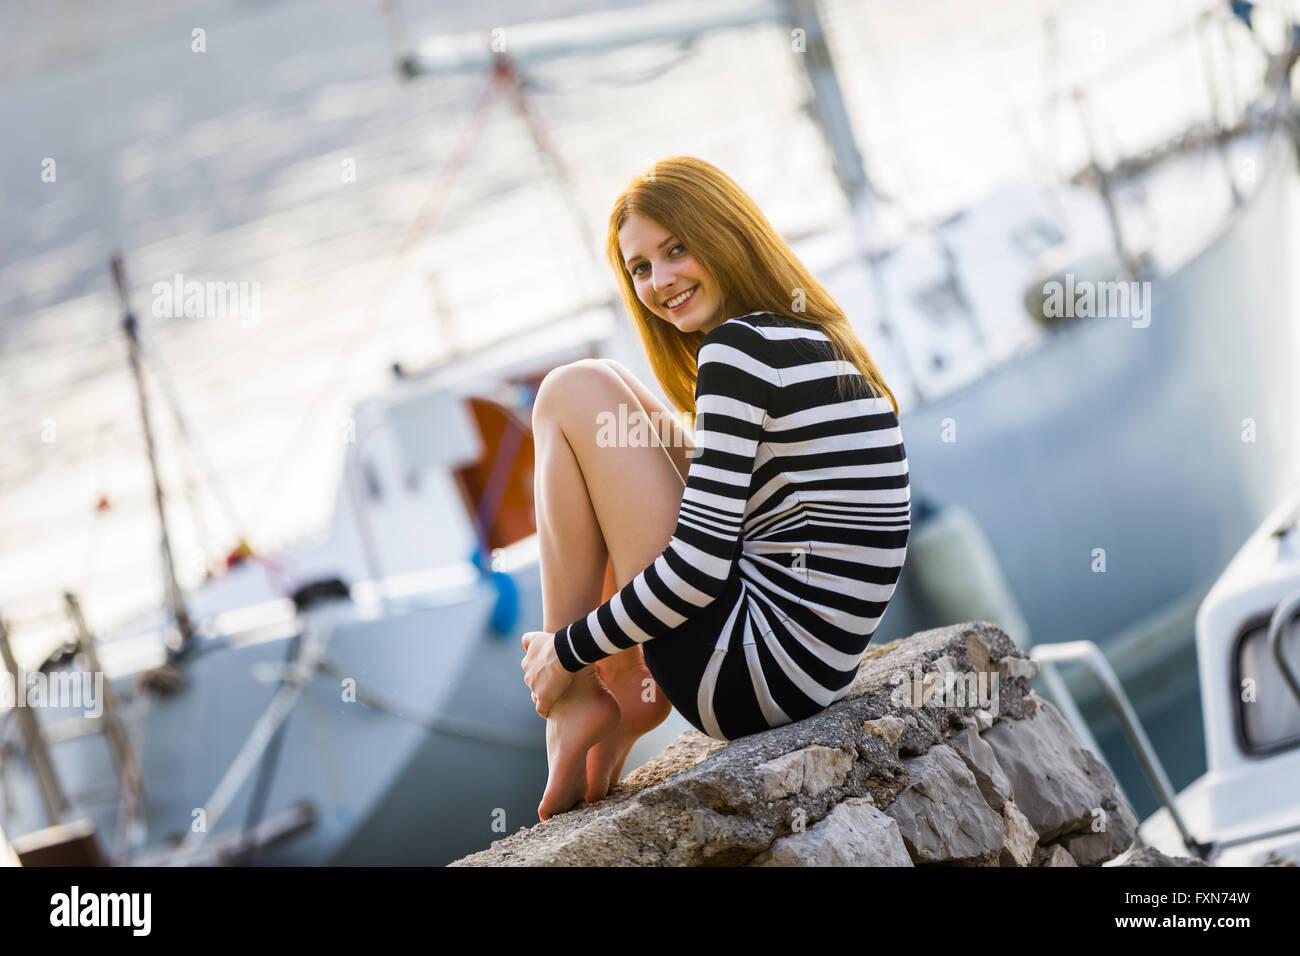 Cute teen girl teengirl posing before yacht in marina tucked legs barefeet bare-feet smiling angled photo outdoors Stock Photo